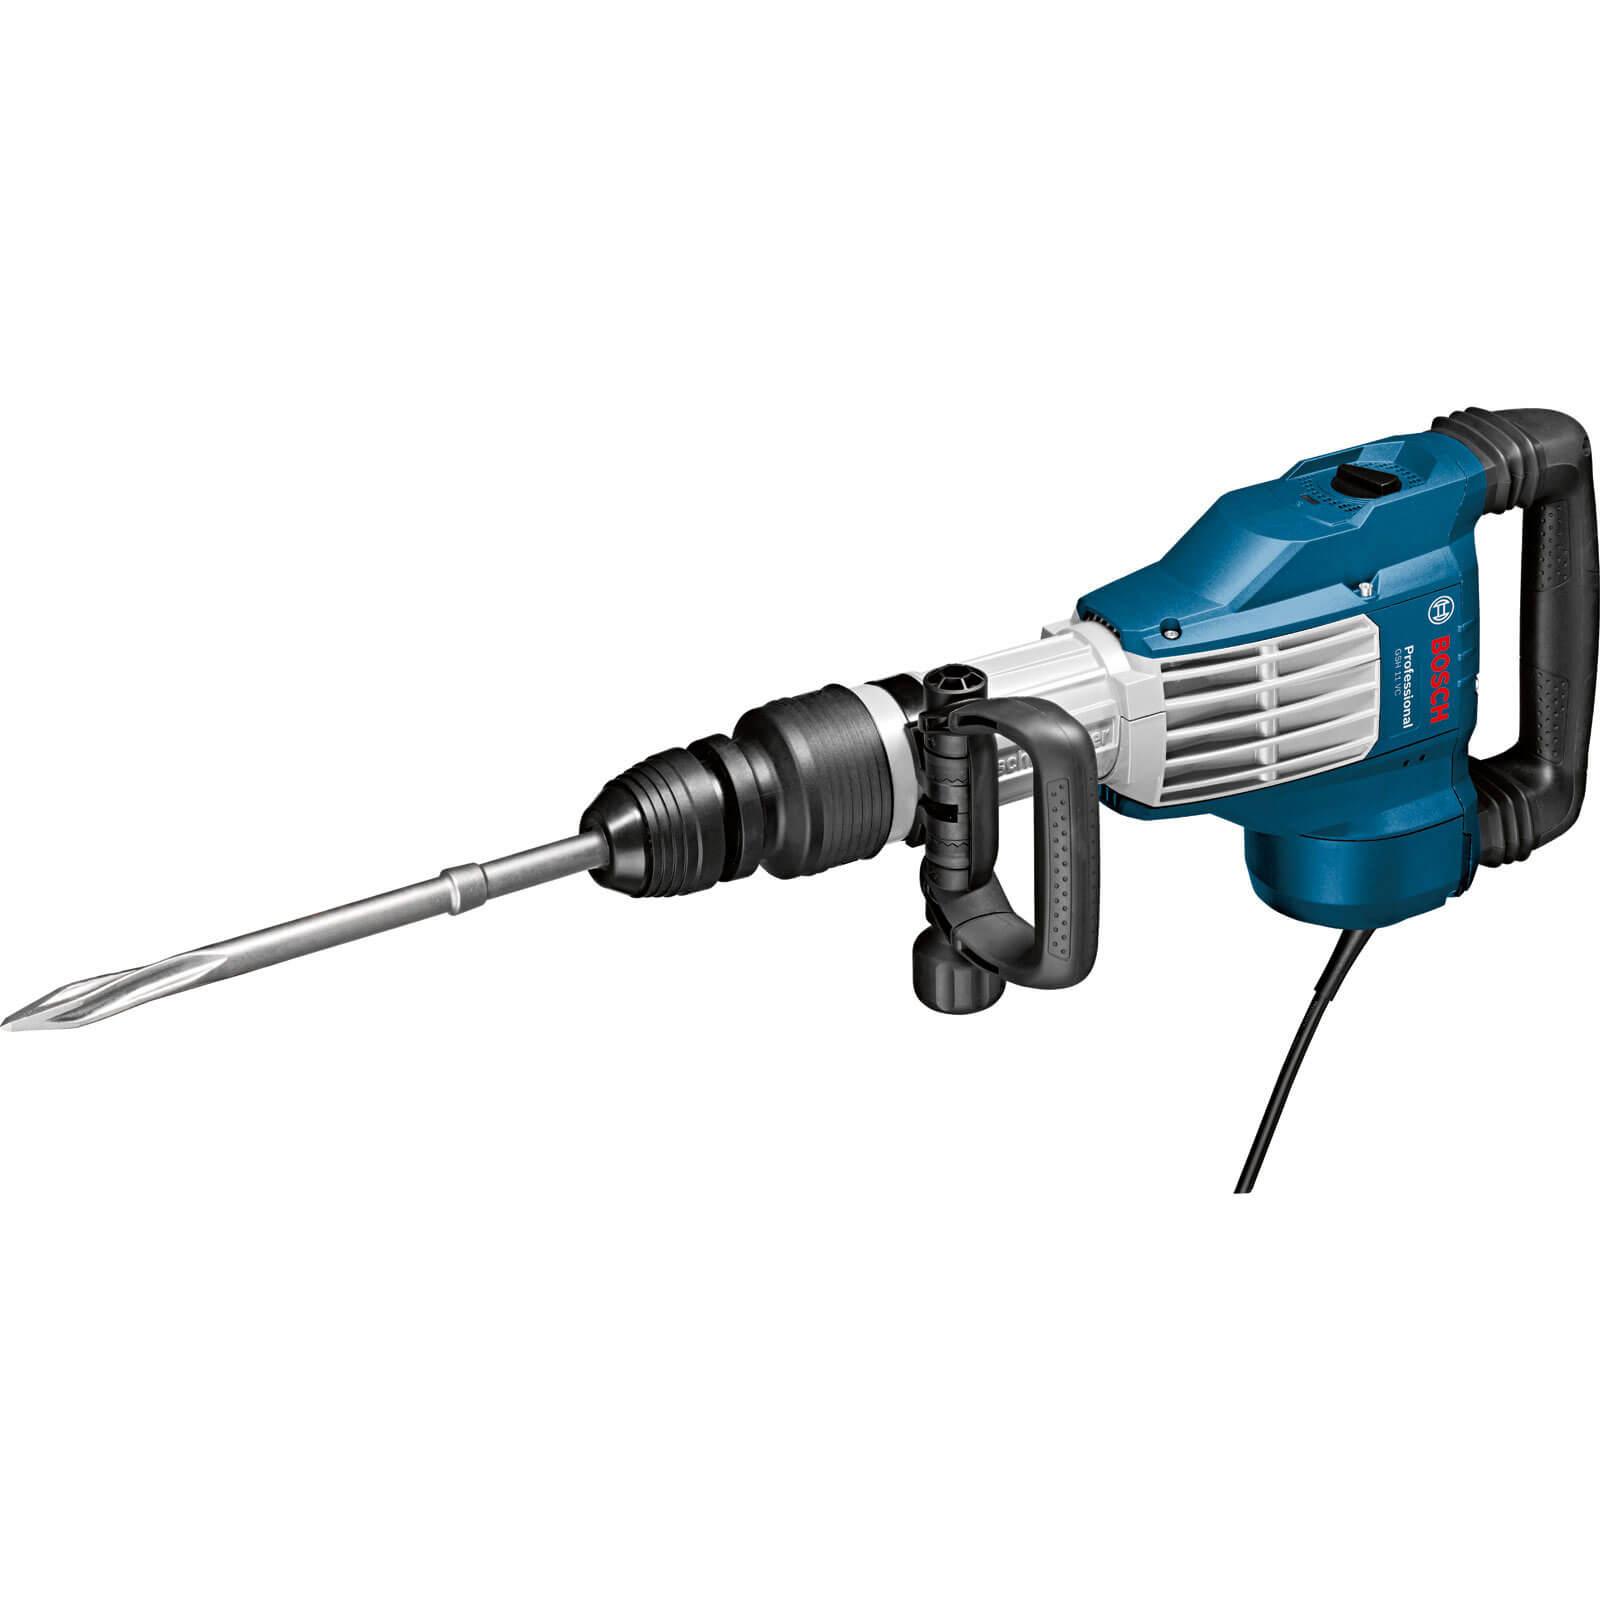 Image of Bosch GSH 11 VC SDS Max Demolition Hammer 110v